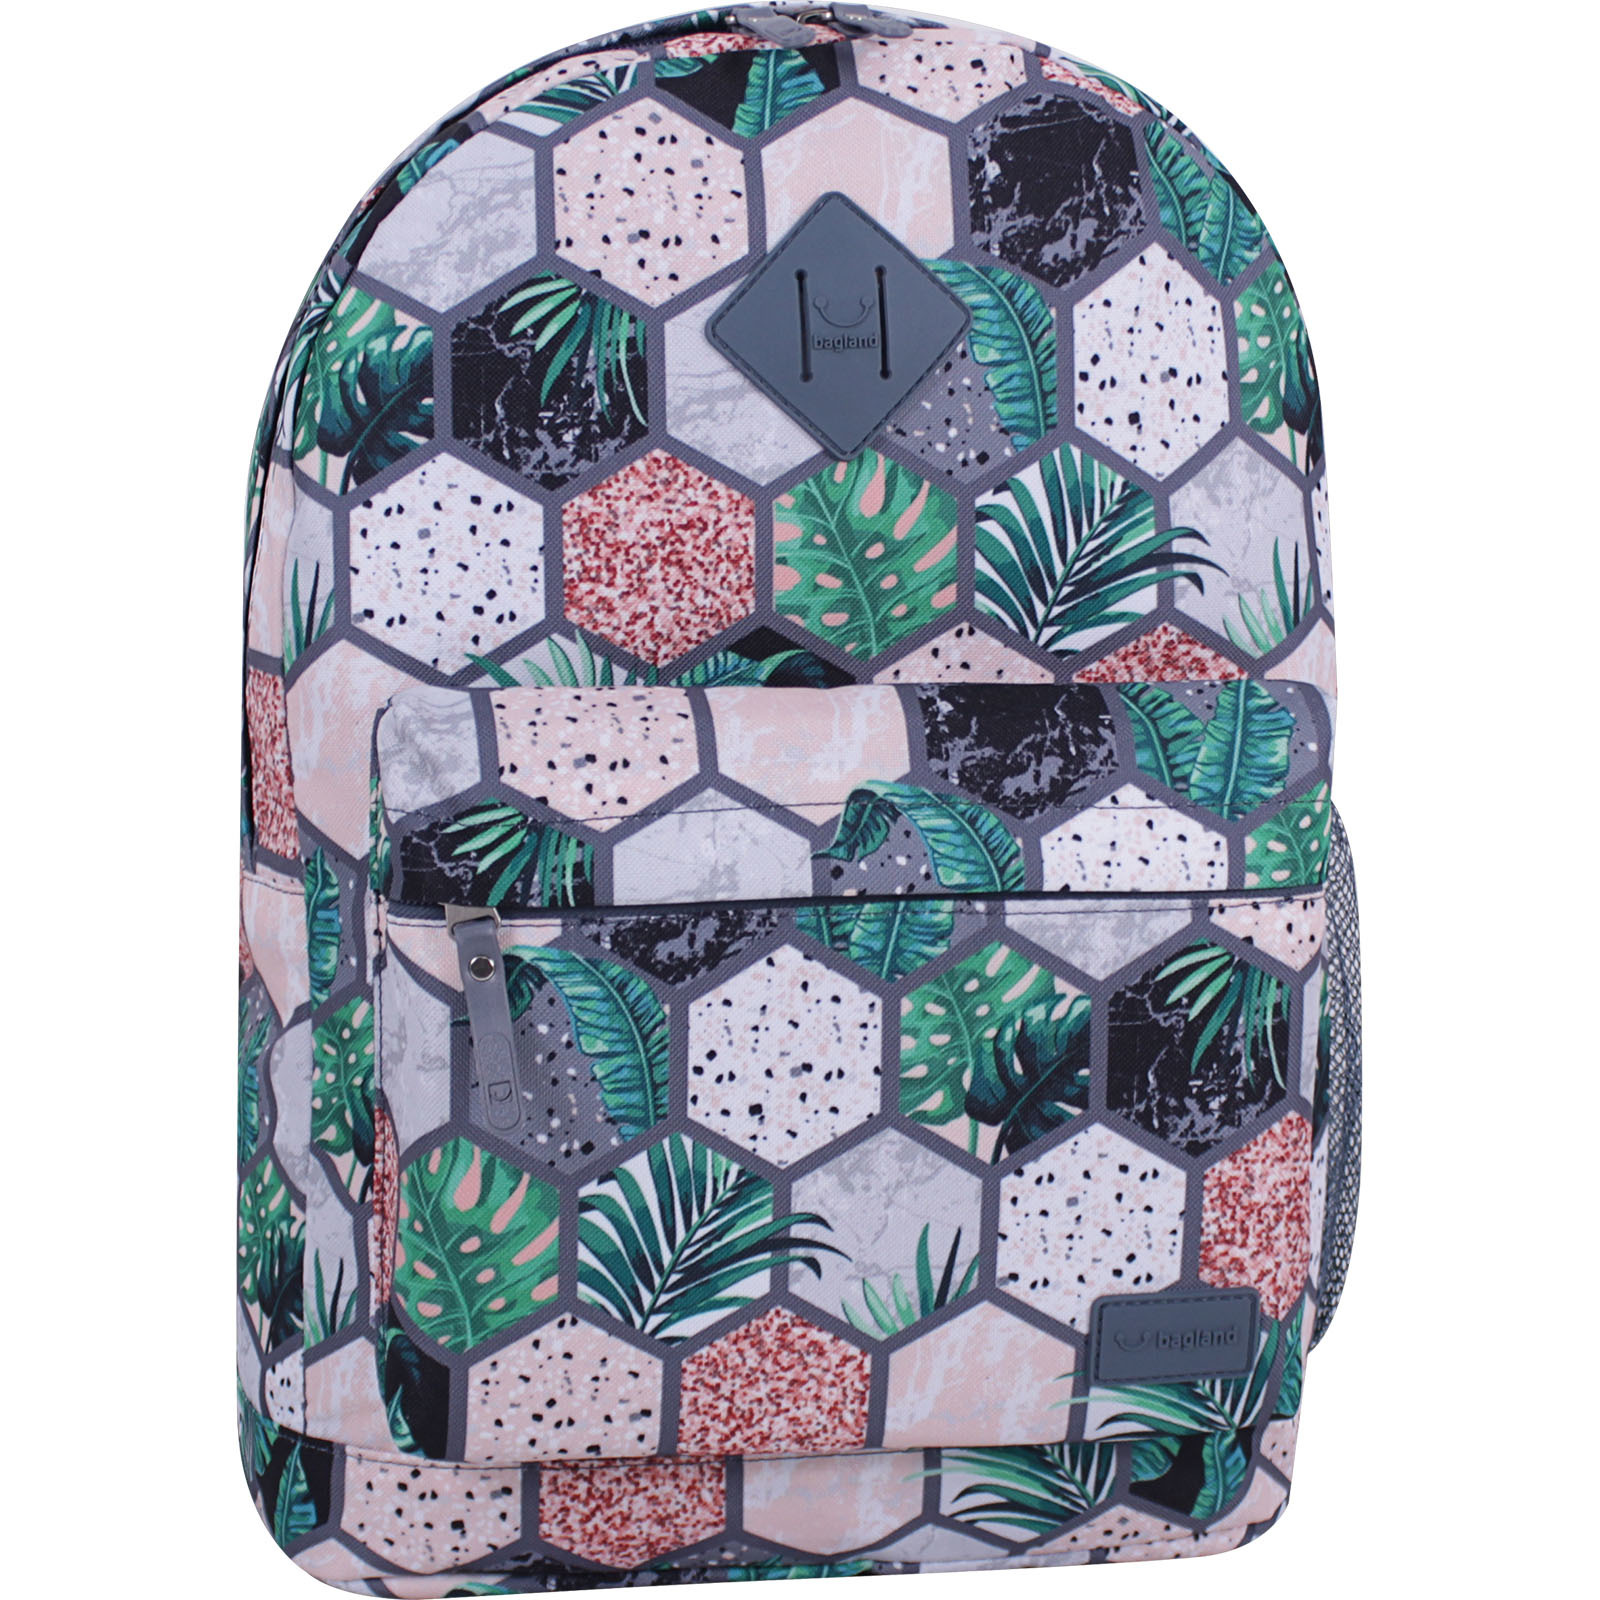 Городские рюкзаки Рюкзак Bagland Молодежный 17 л. сублимация 757 (00533664) IMG_7001_суб.757_-1600.jpg